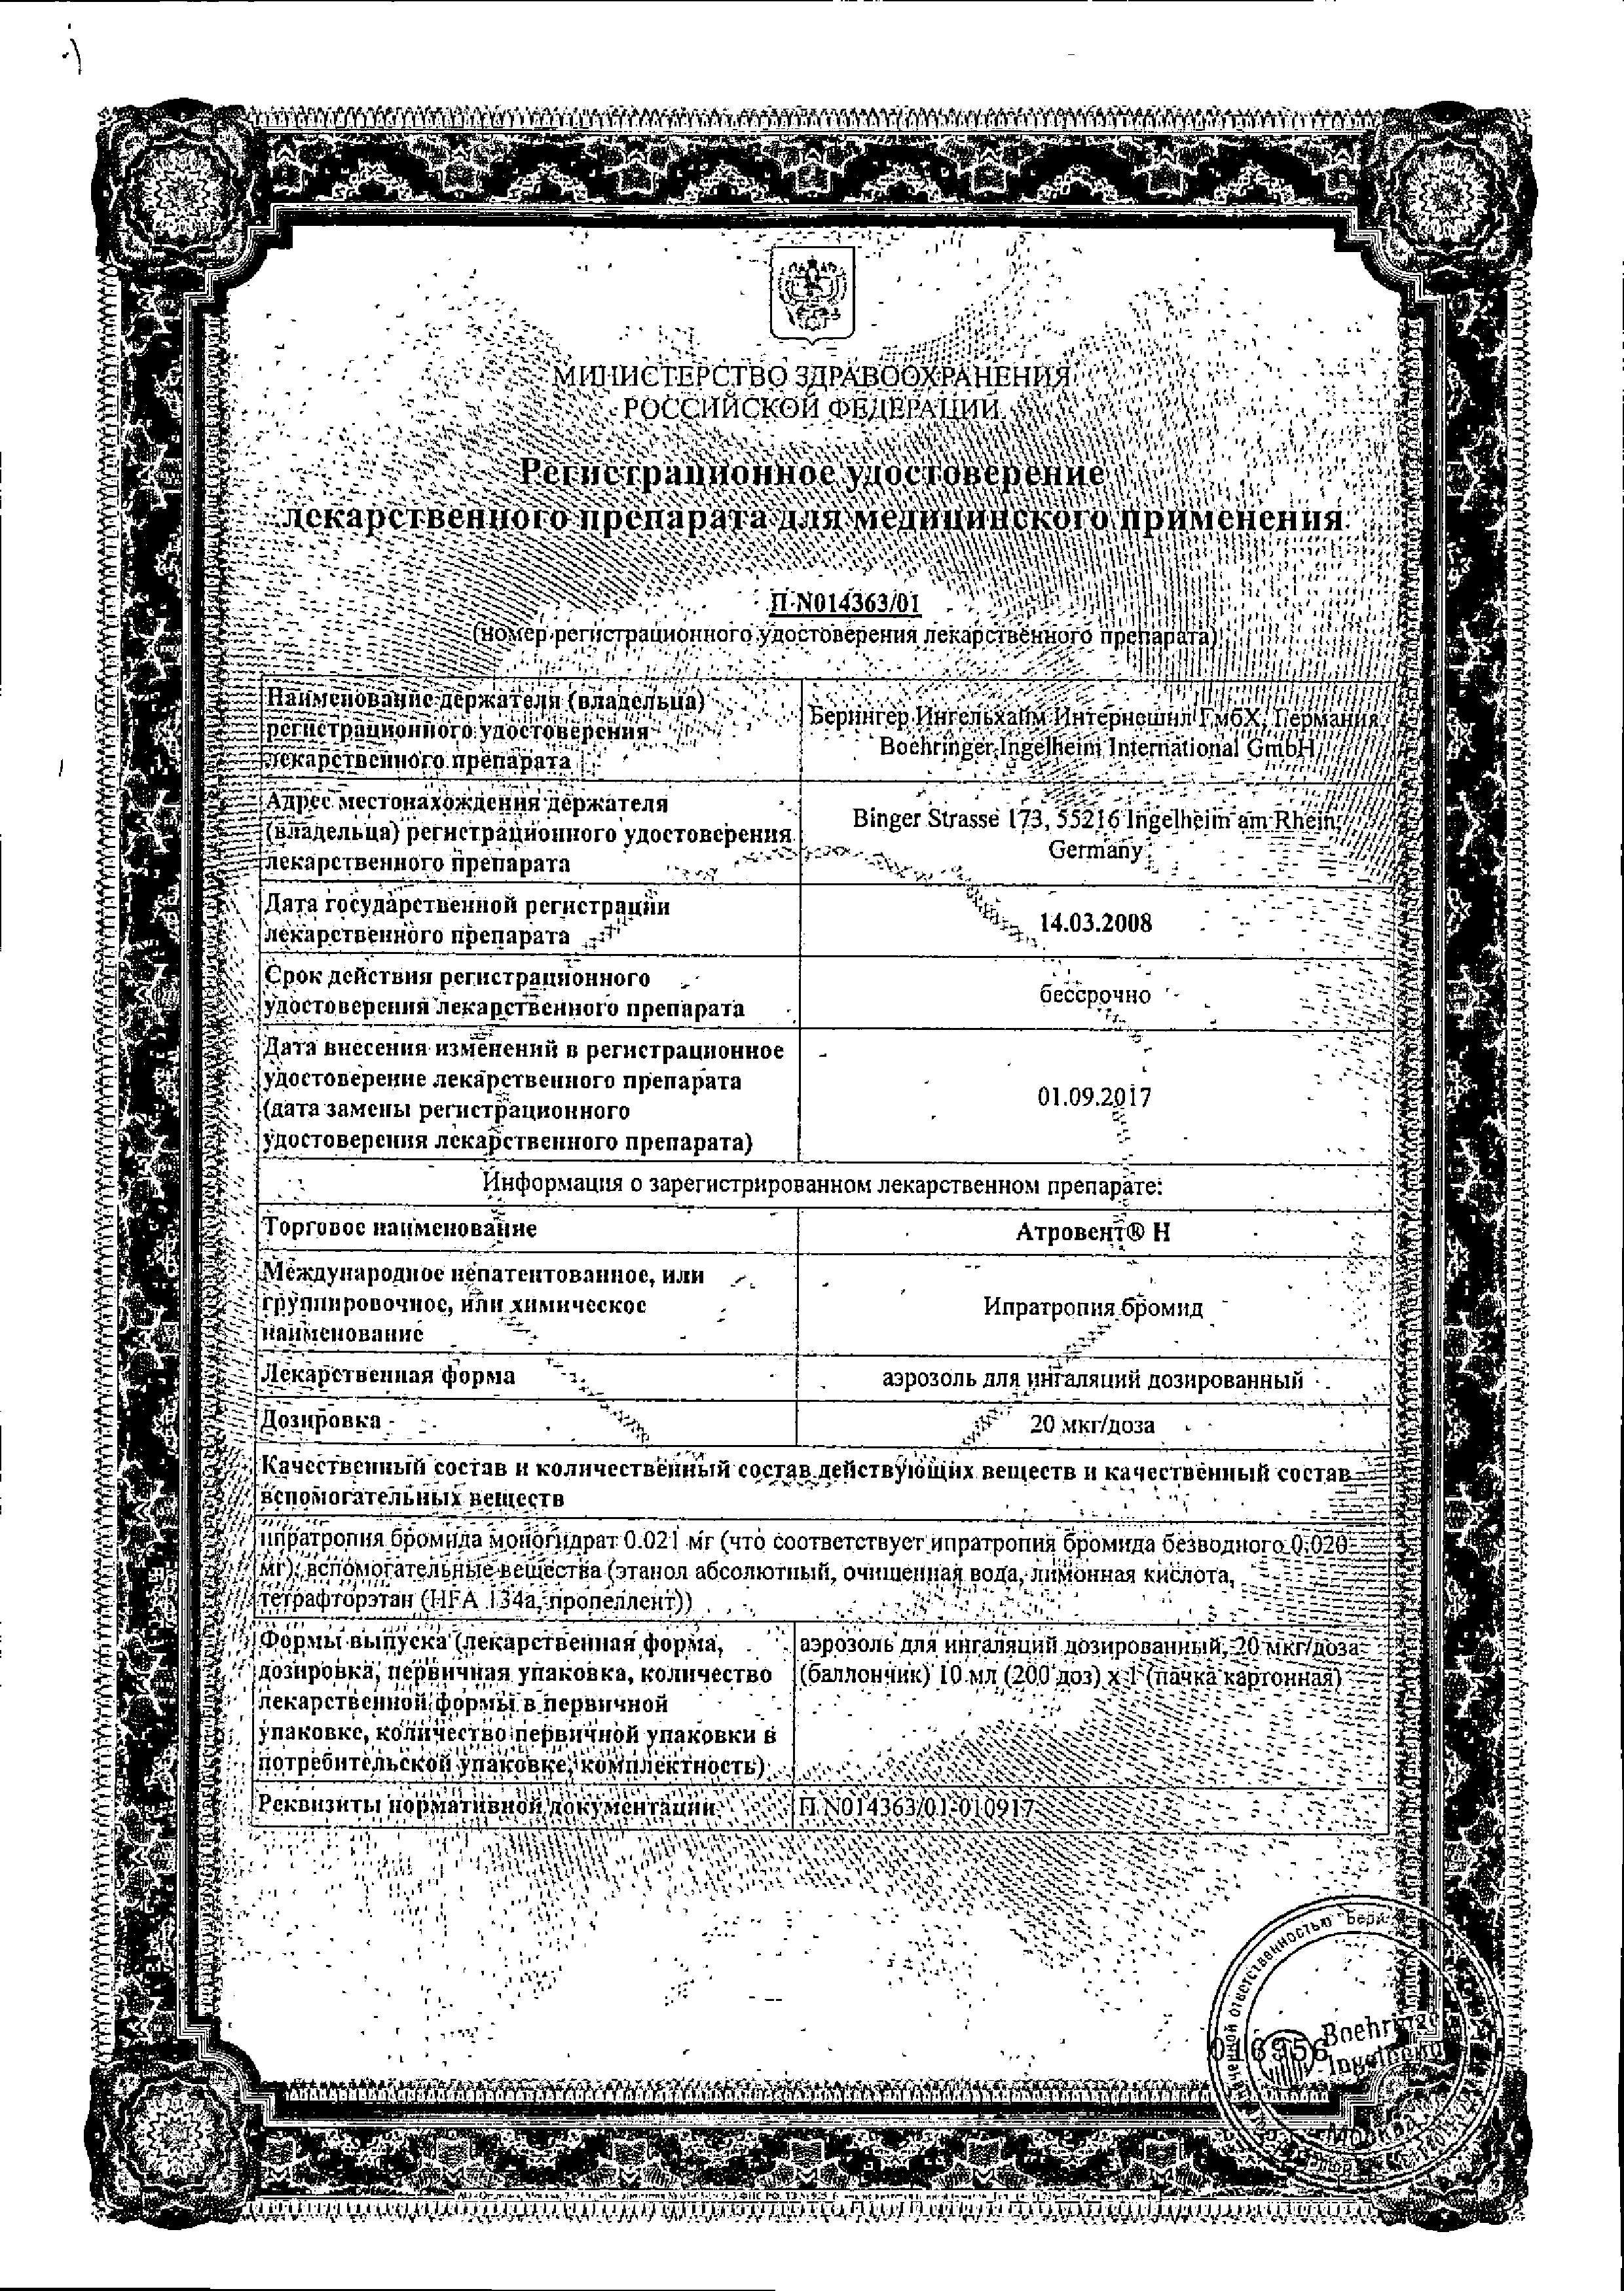 Атровент Н сертификат